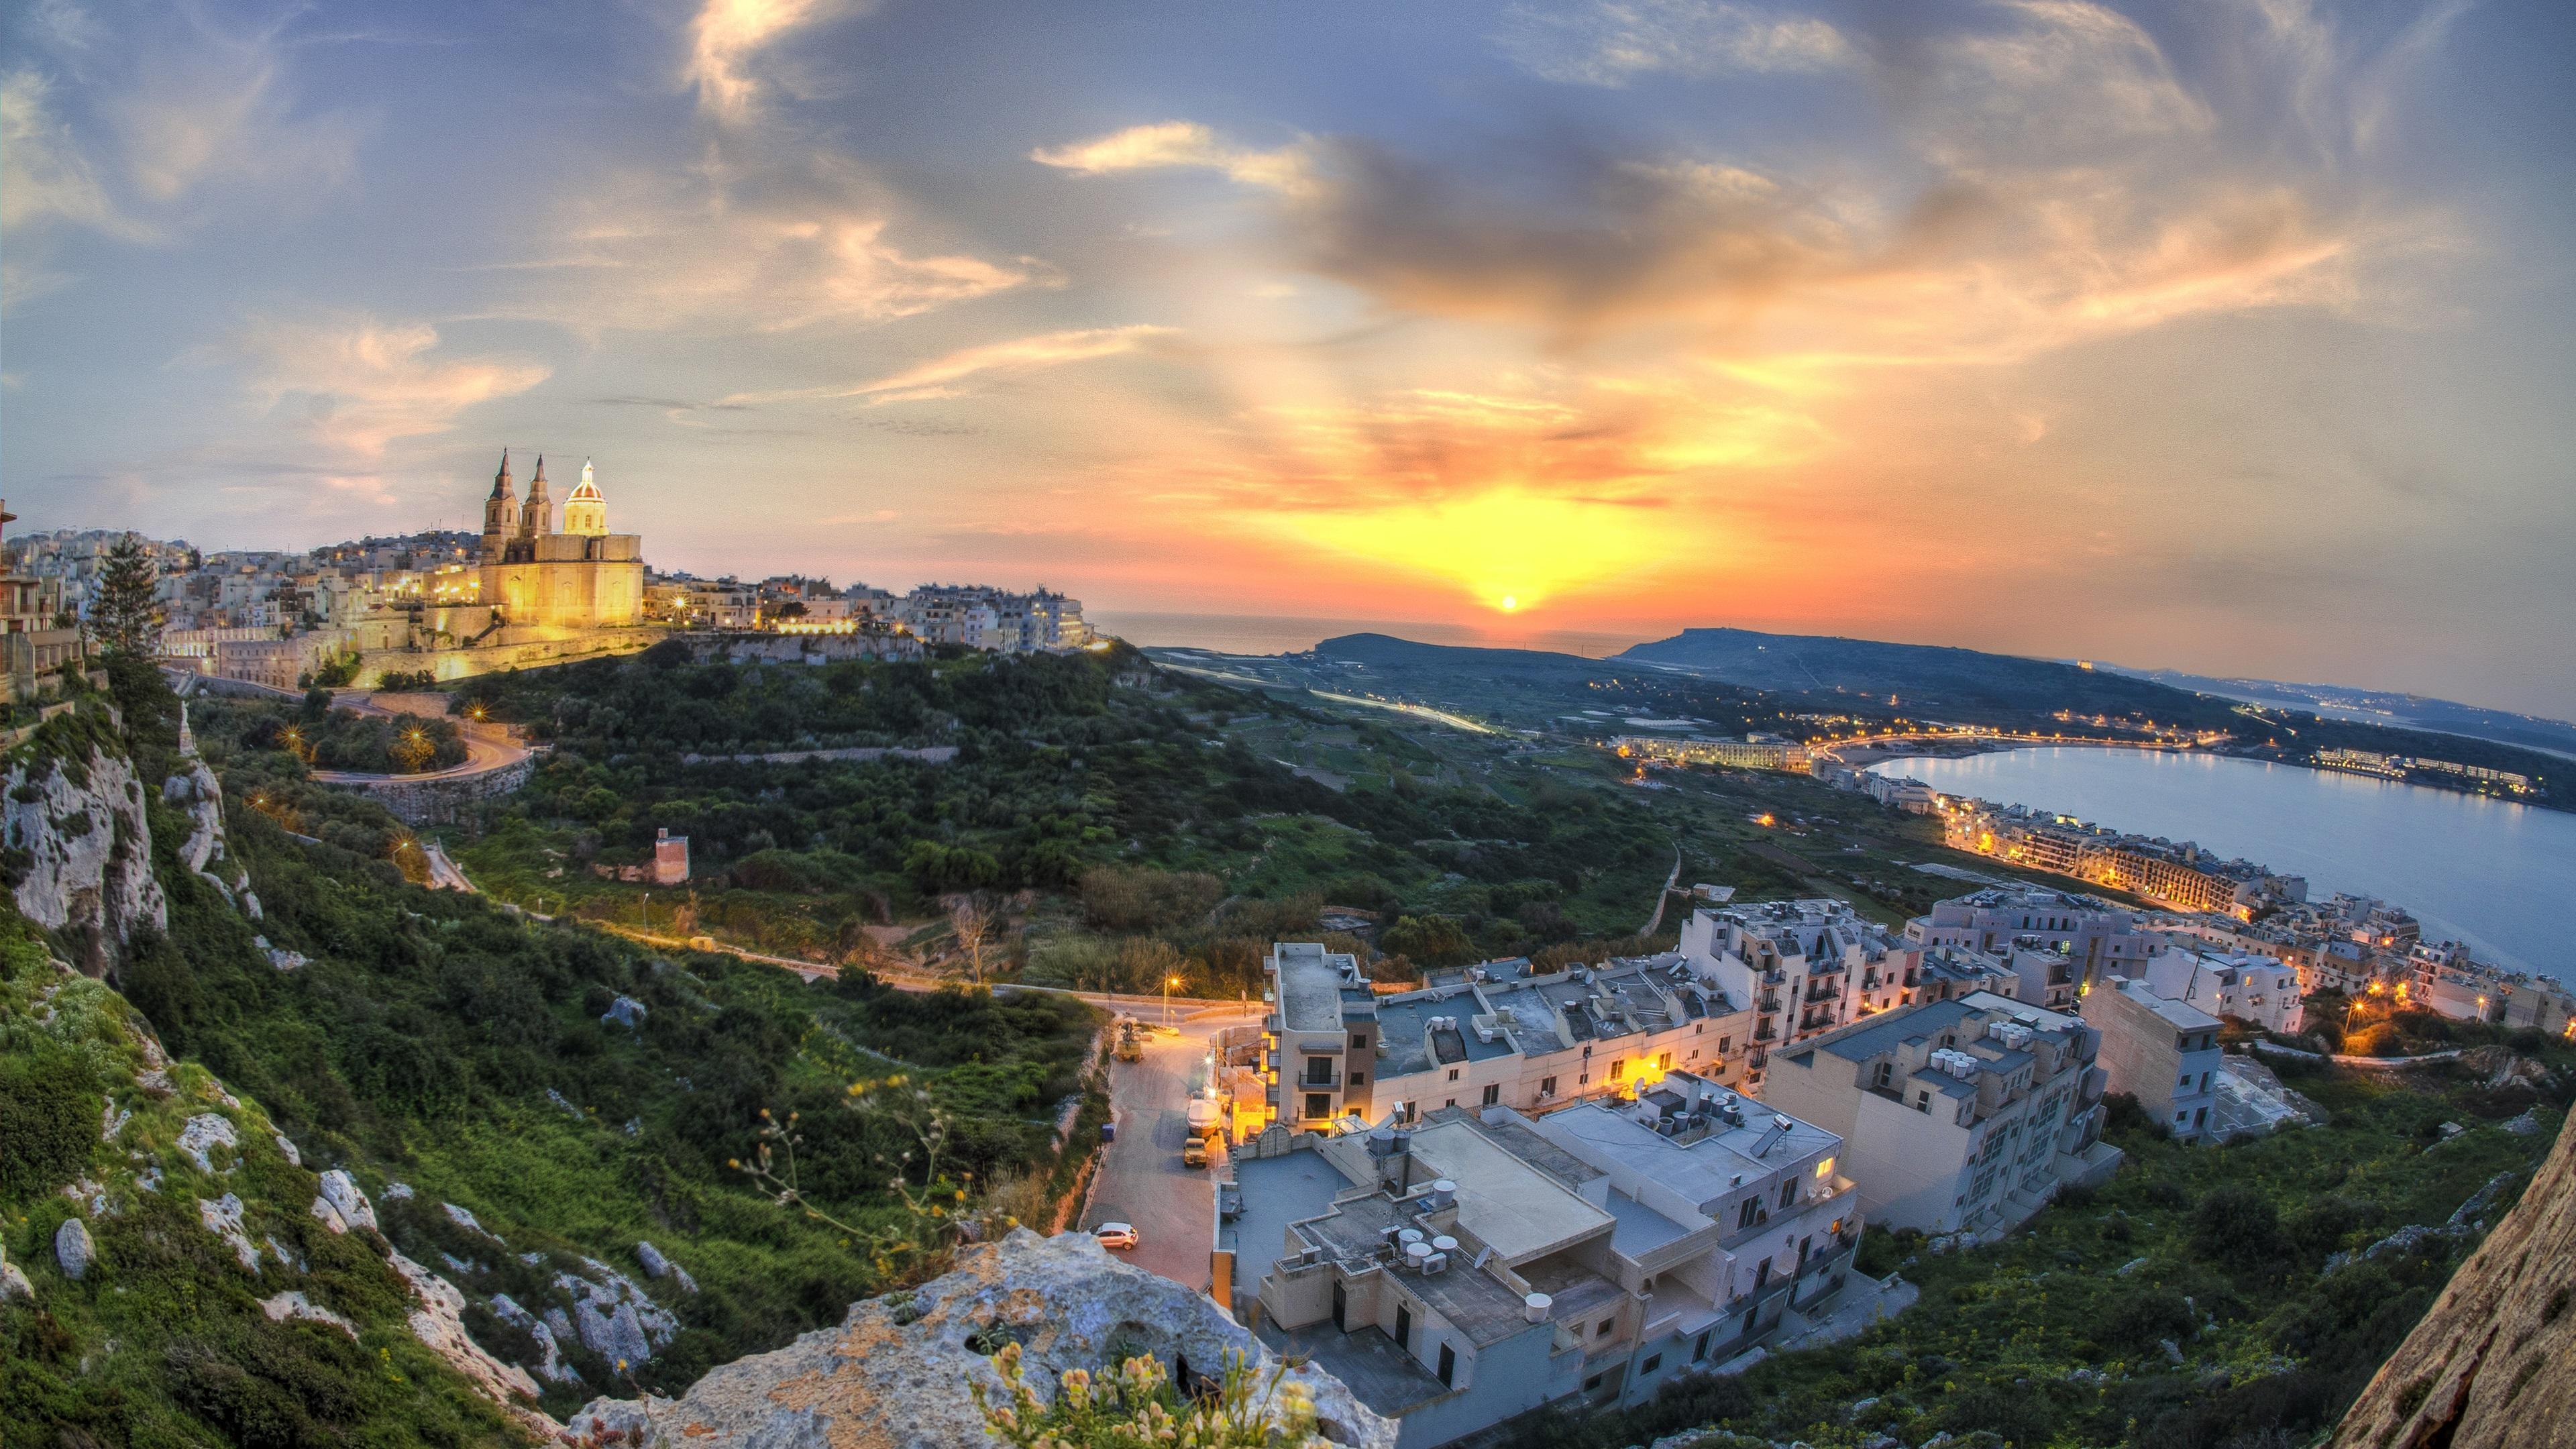 Full Size Hd Wallpaper 1080p Beautiful Island Of Malta At Sunset Red Sky Coast